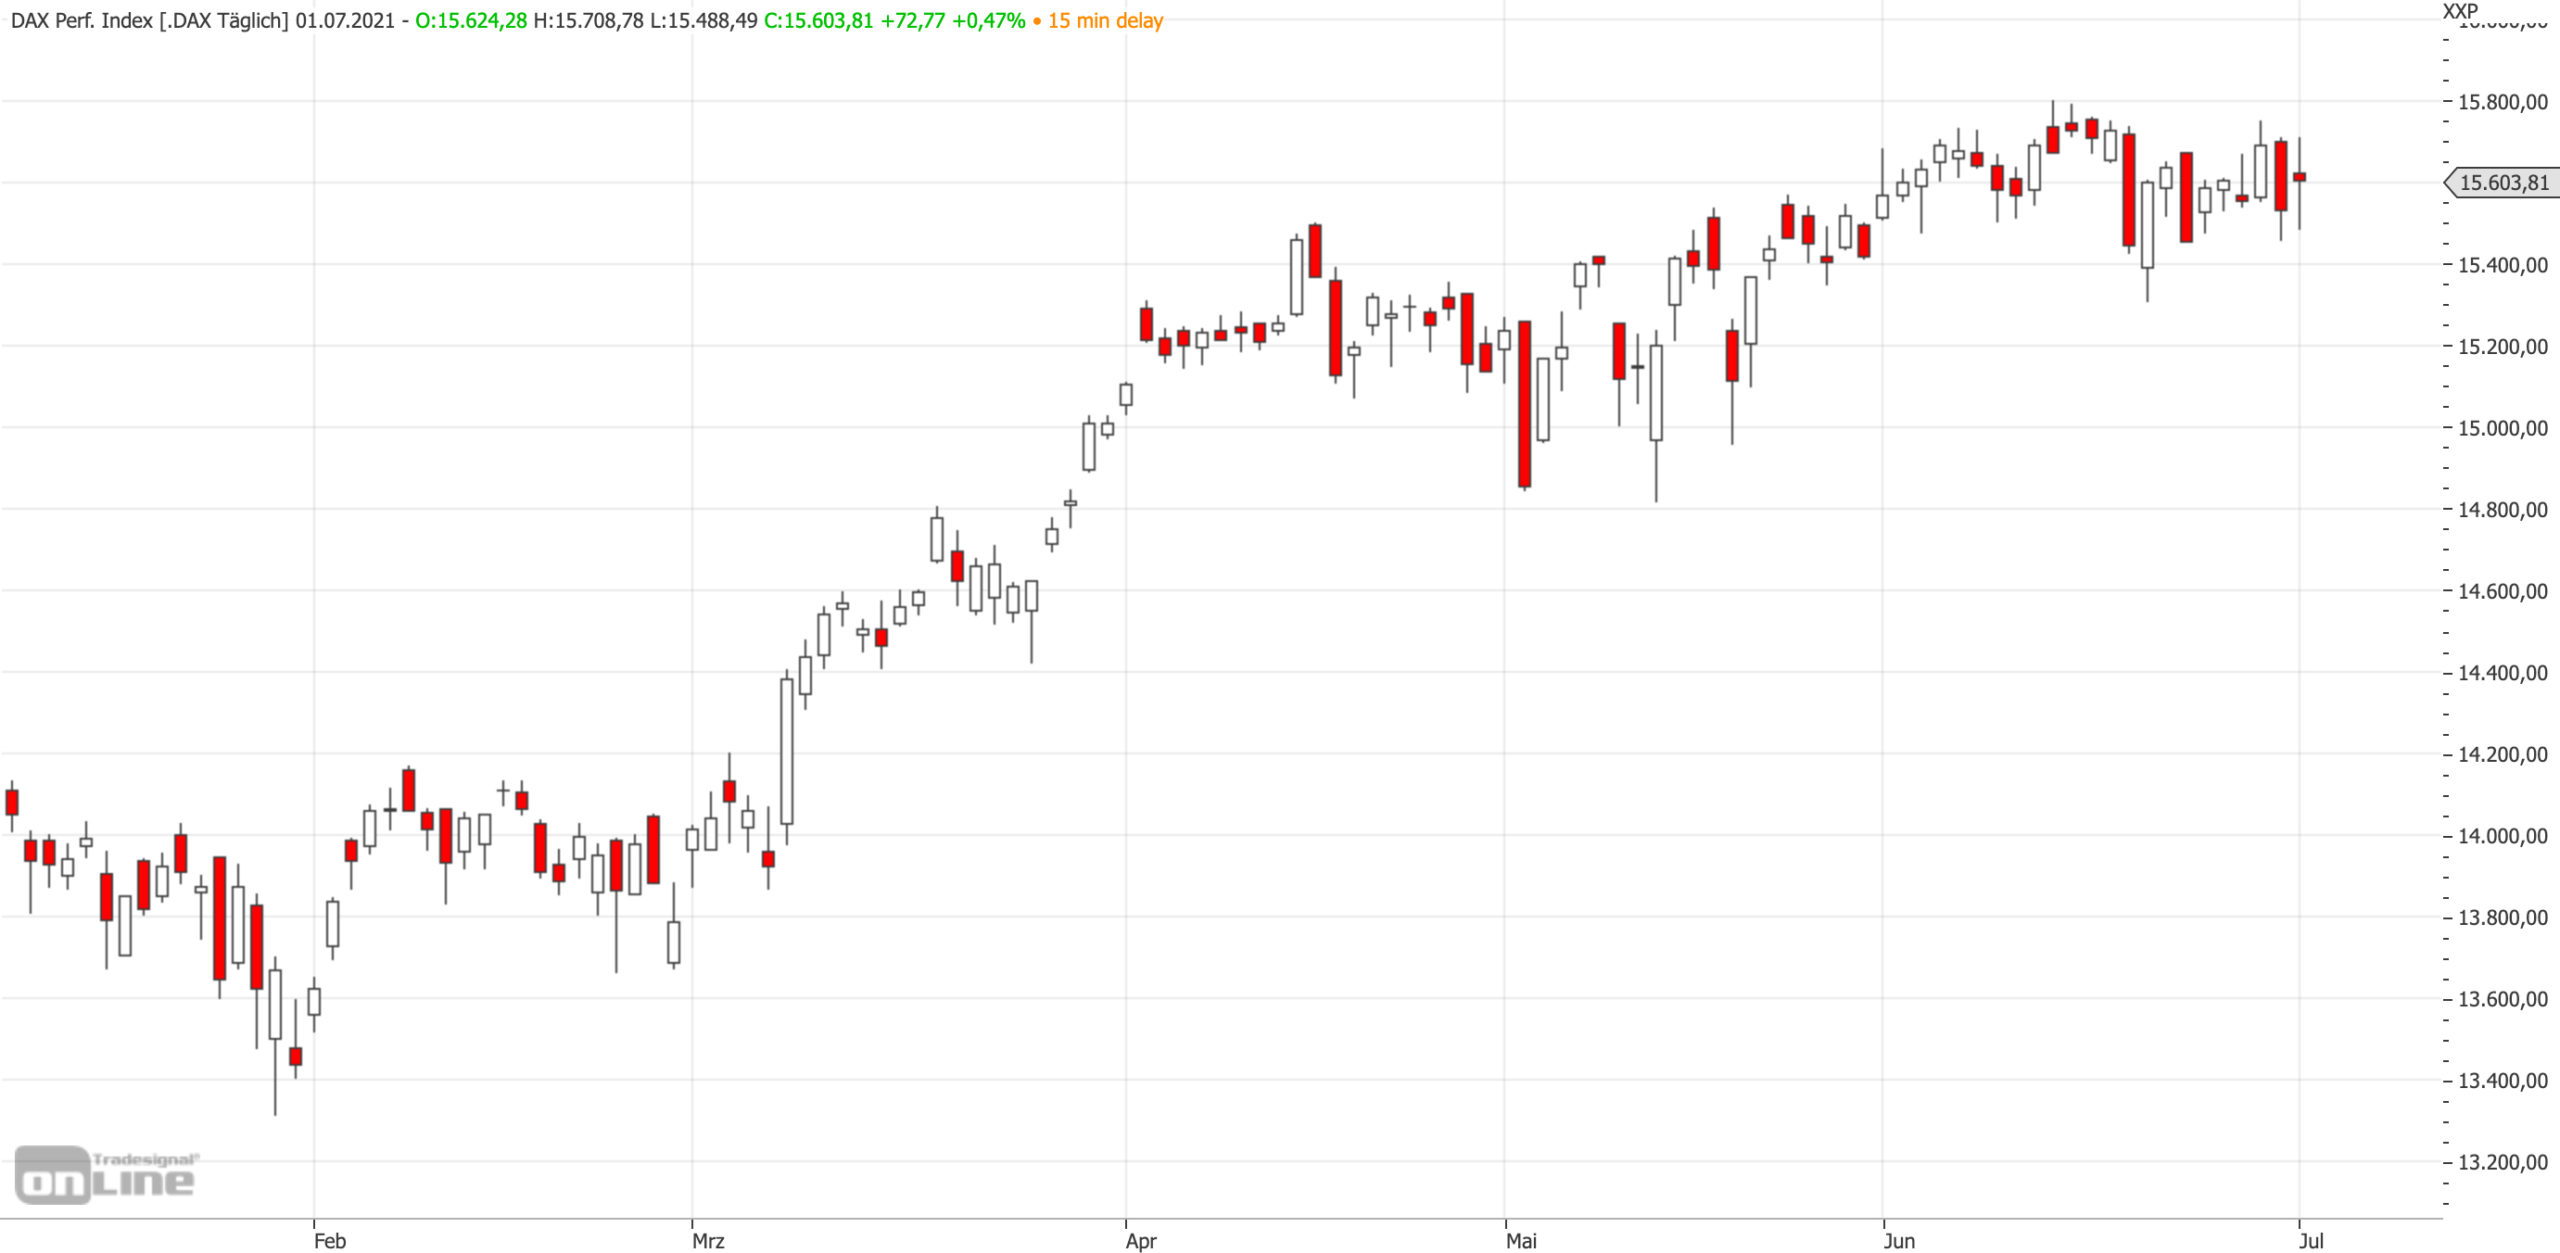 Mittelfristiger DAX-Chart am 01.07.2021